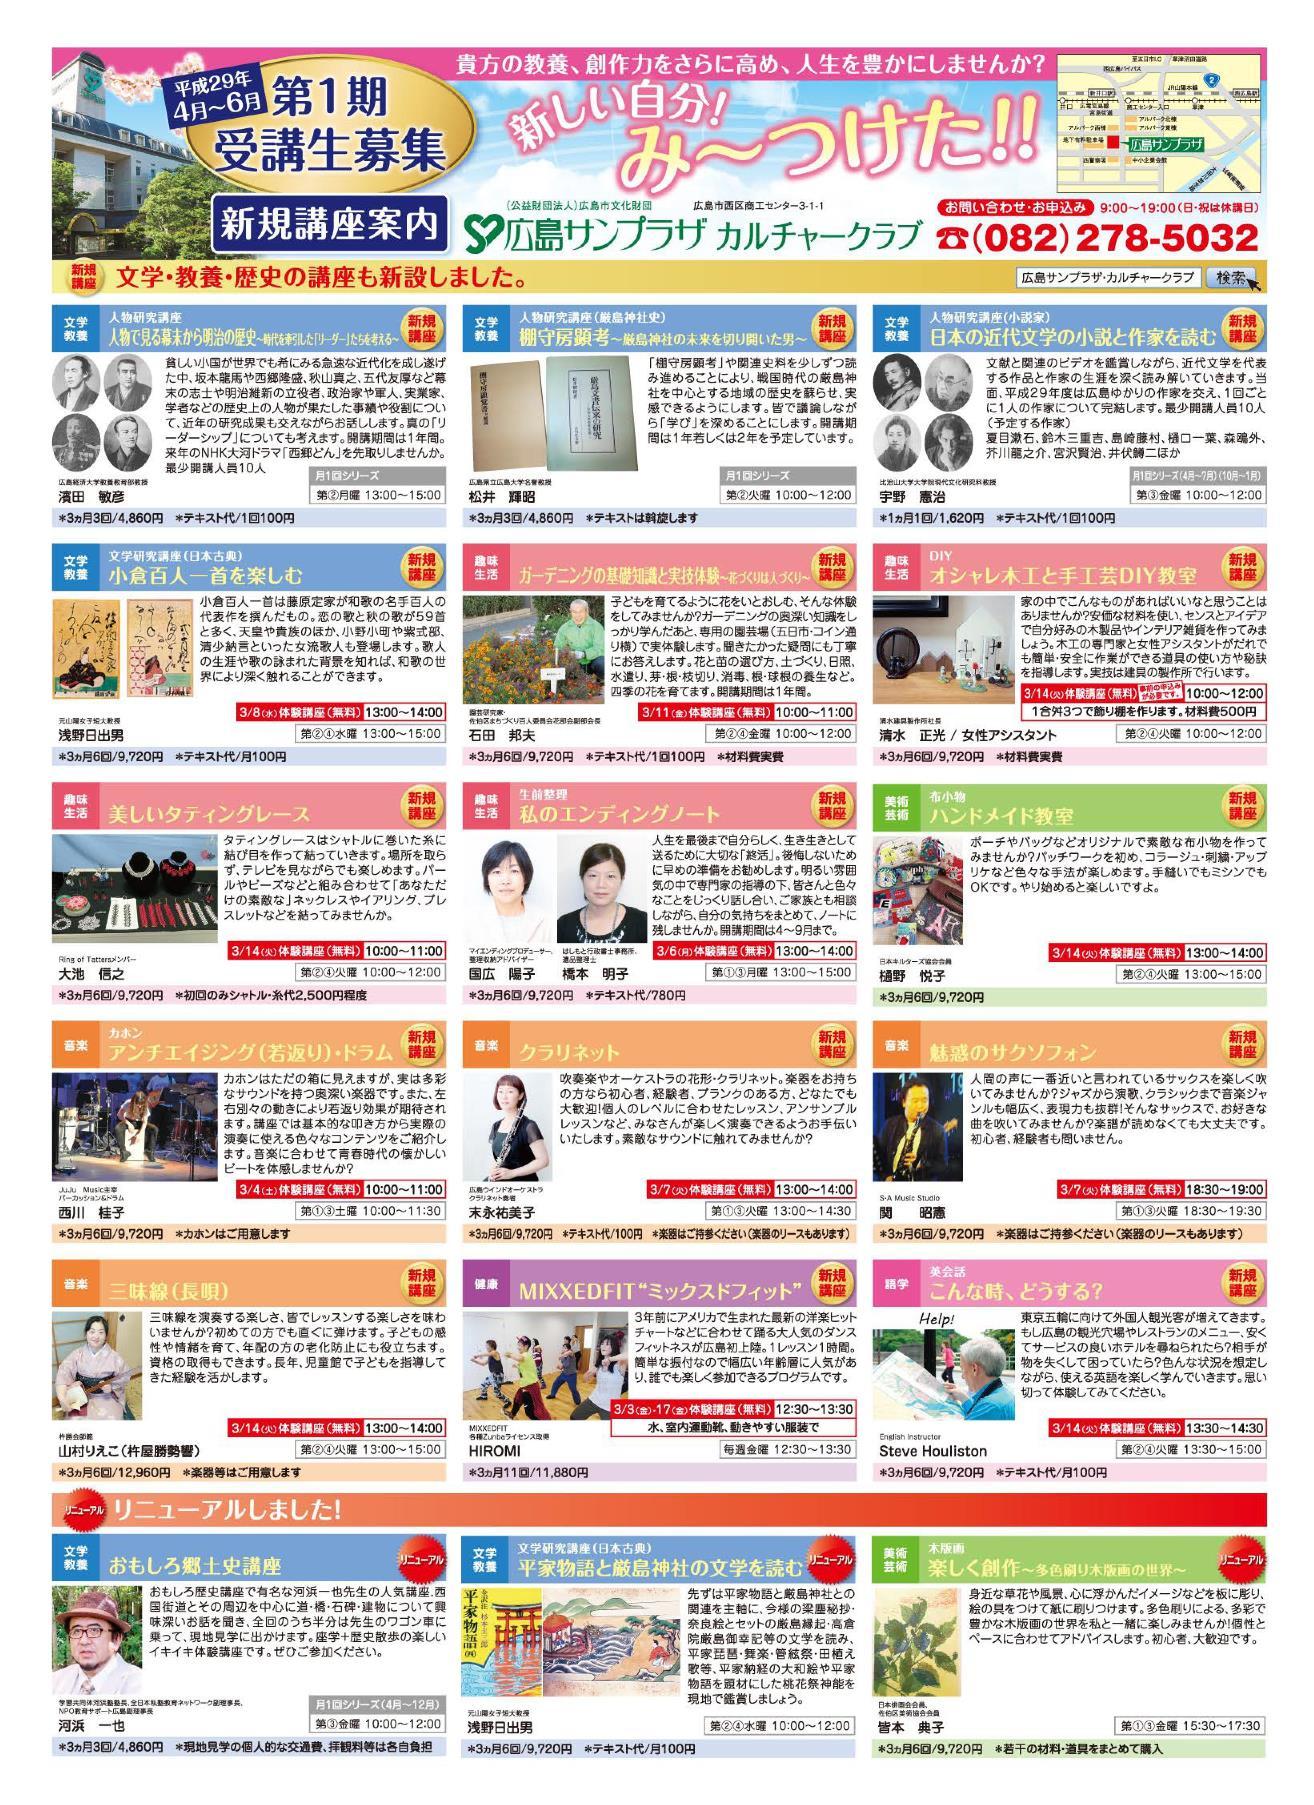 http://hiroshima-sunplaza.or.jp/blog/%E5%B9%B3%E6%88%9029%E5%B9%B4%E5%BA%A61%E6%9C%9F_1web.jpg